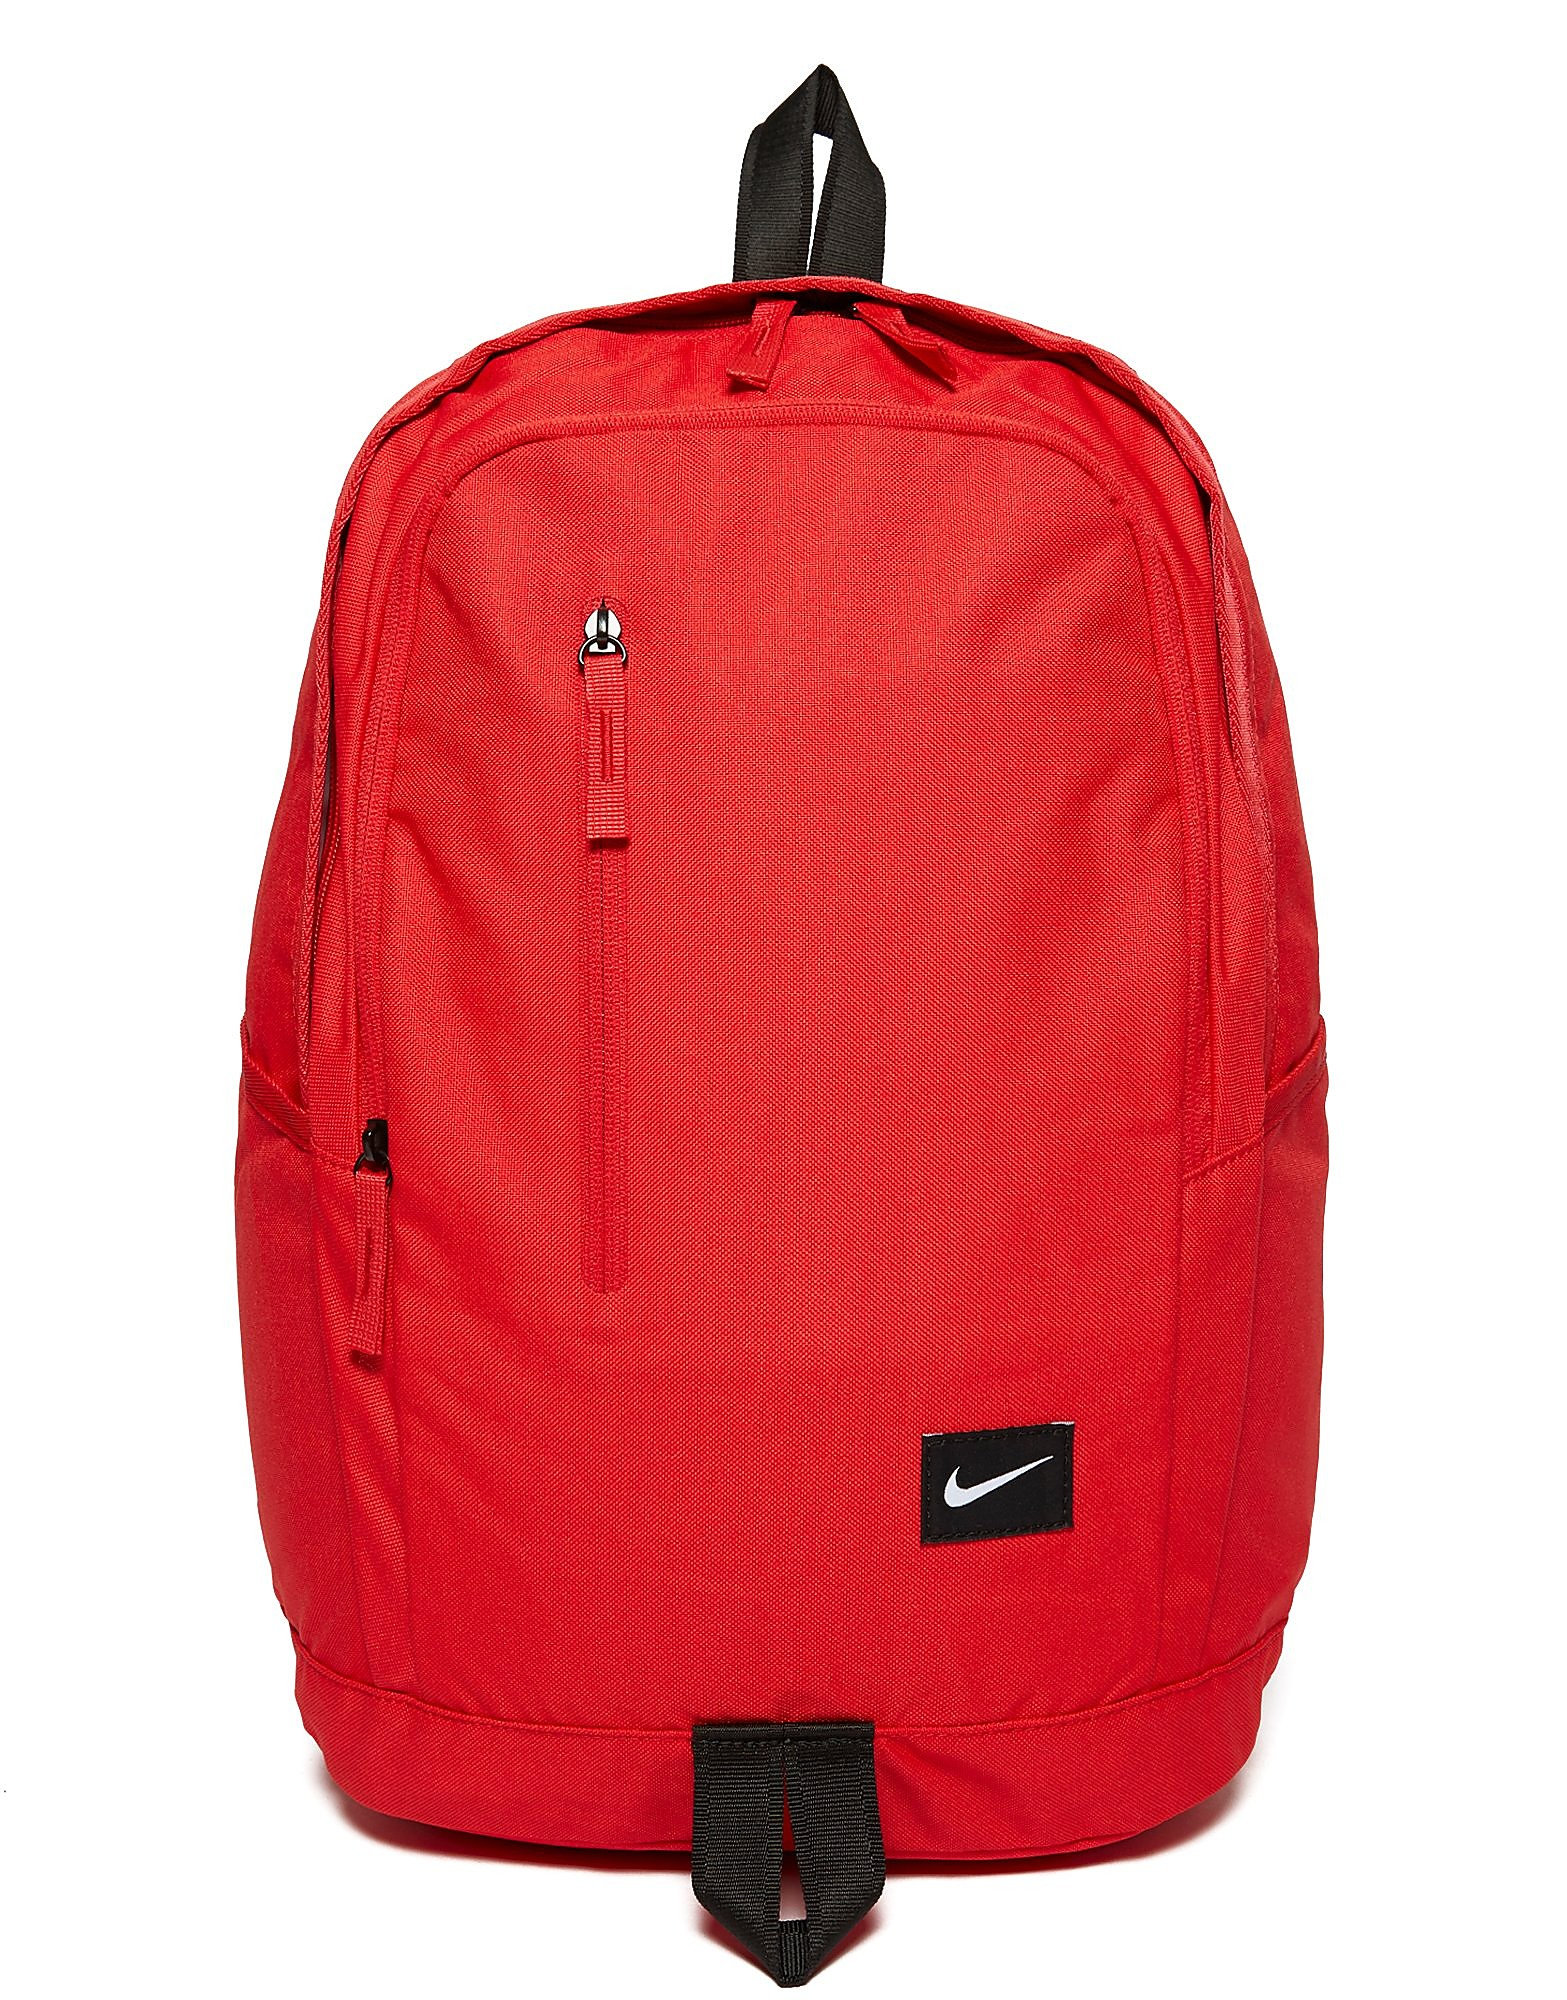 Nike Soleday Backpack - University Red - Mens, University Red